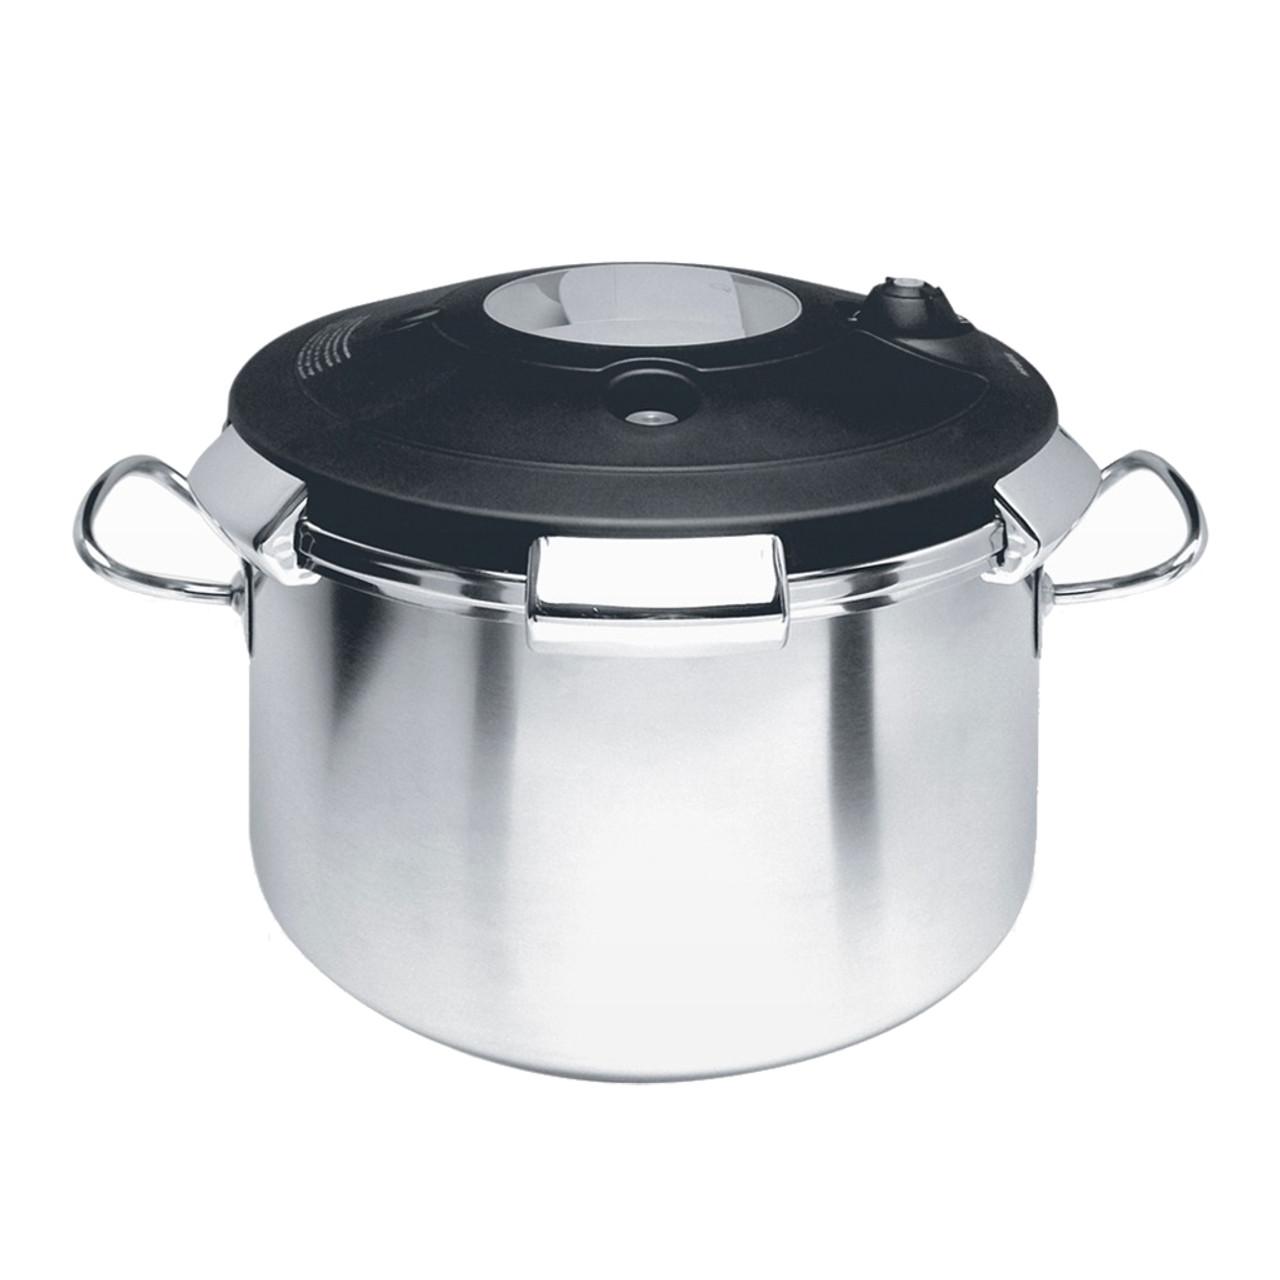 Artame 15lt Luna Pressure Cooker